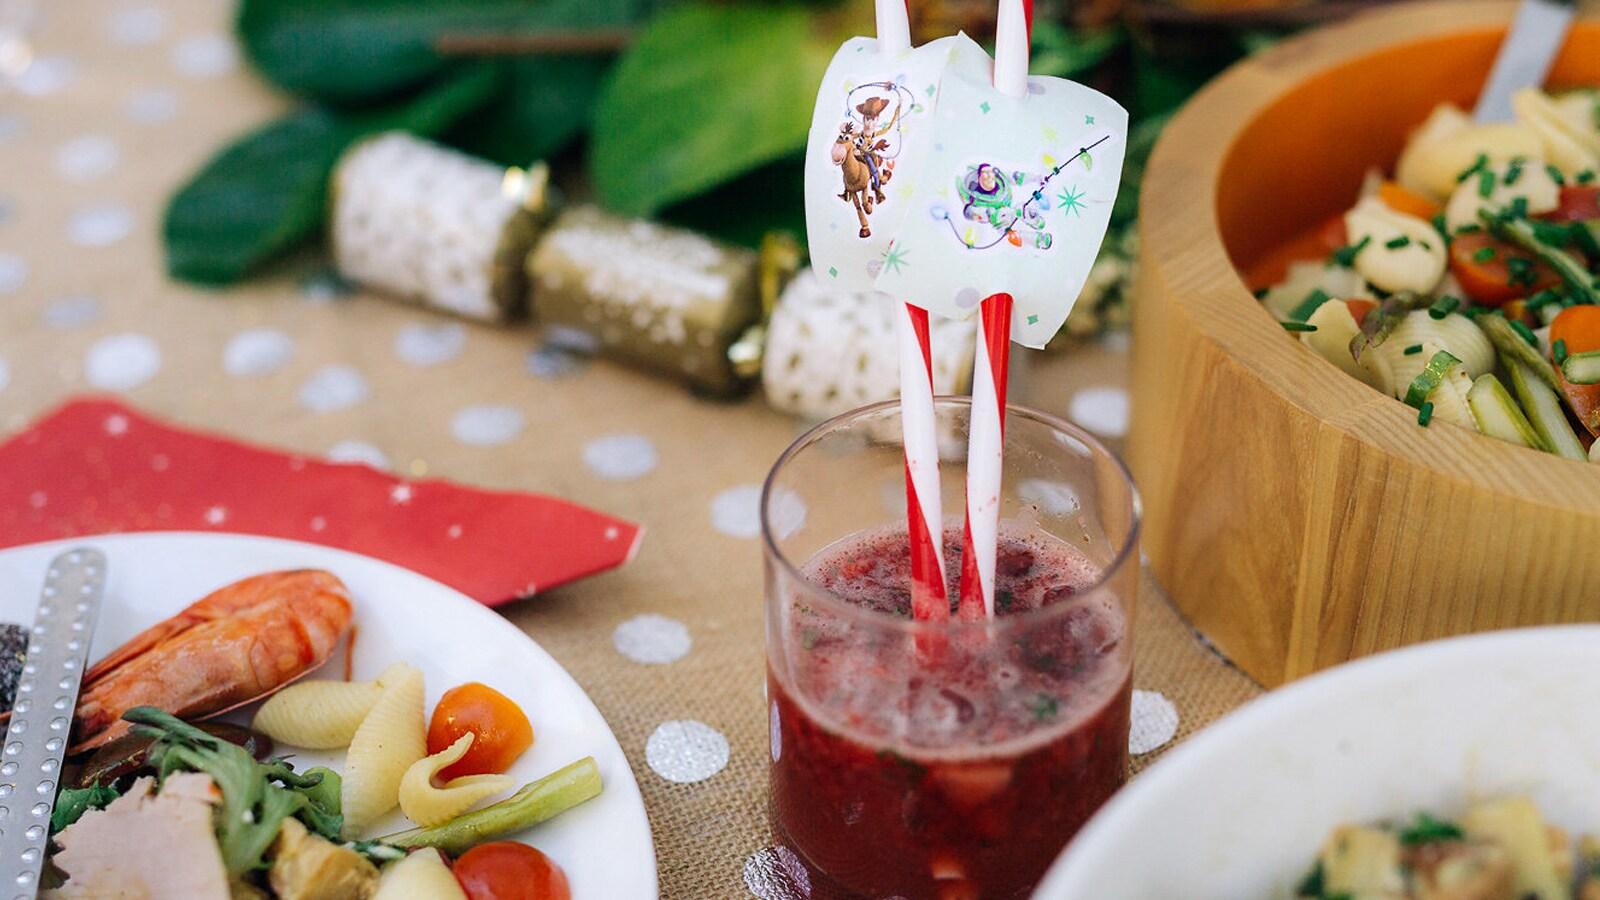 Berry Lemonade Recipe